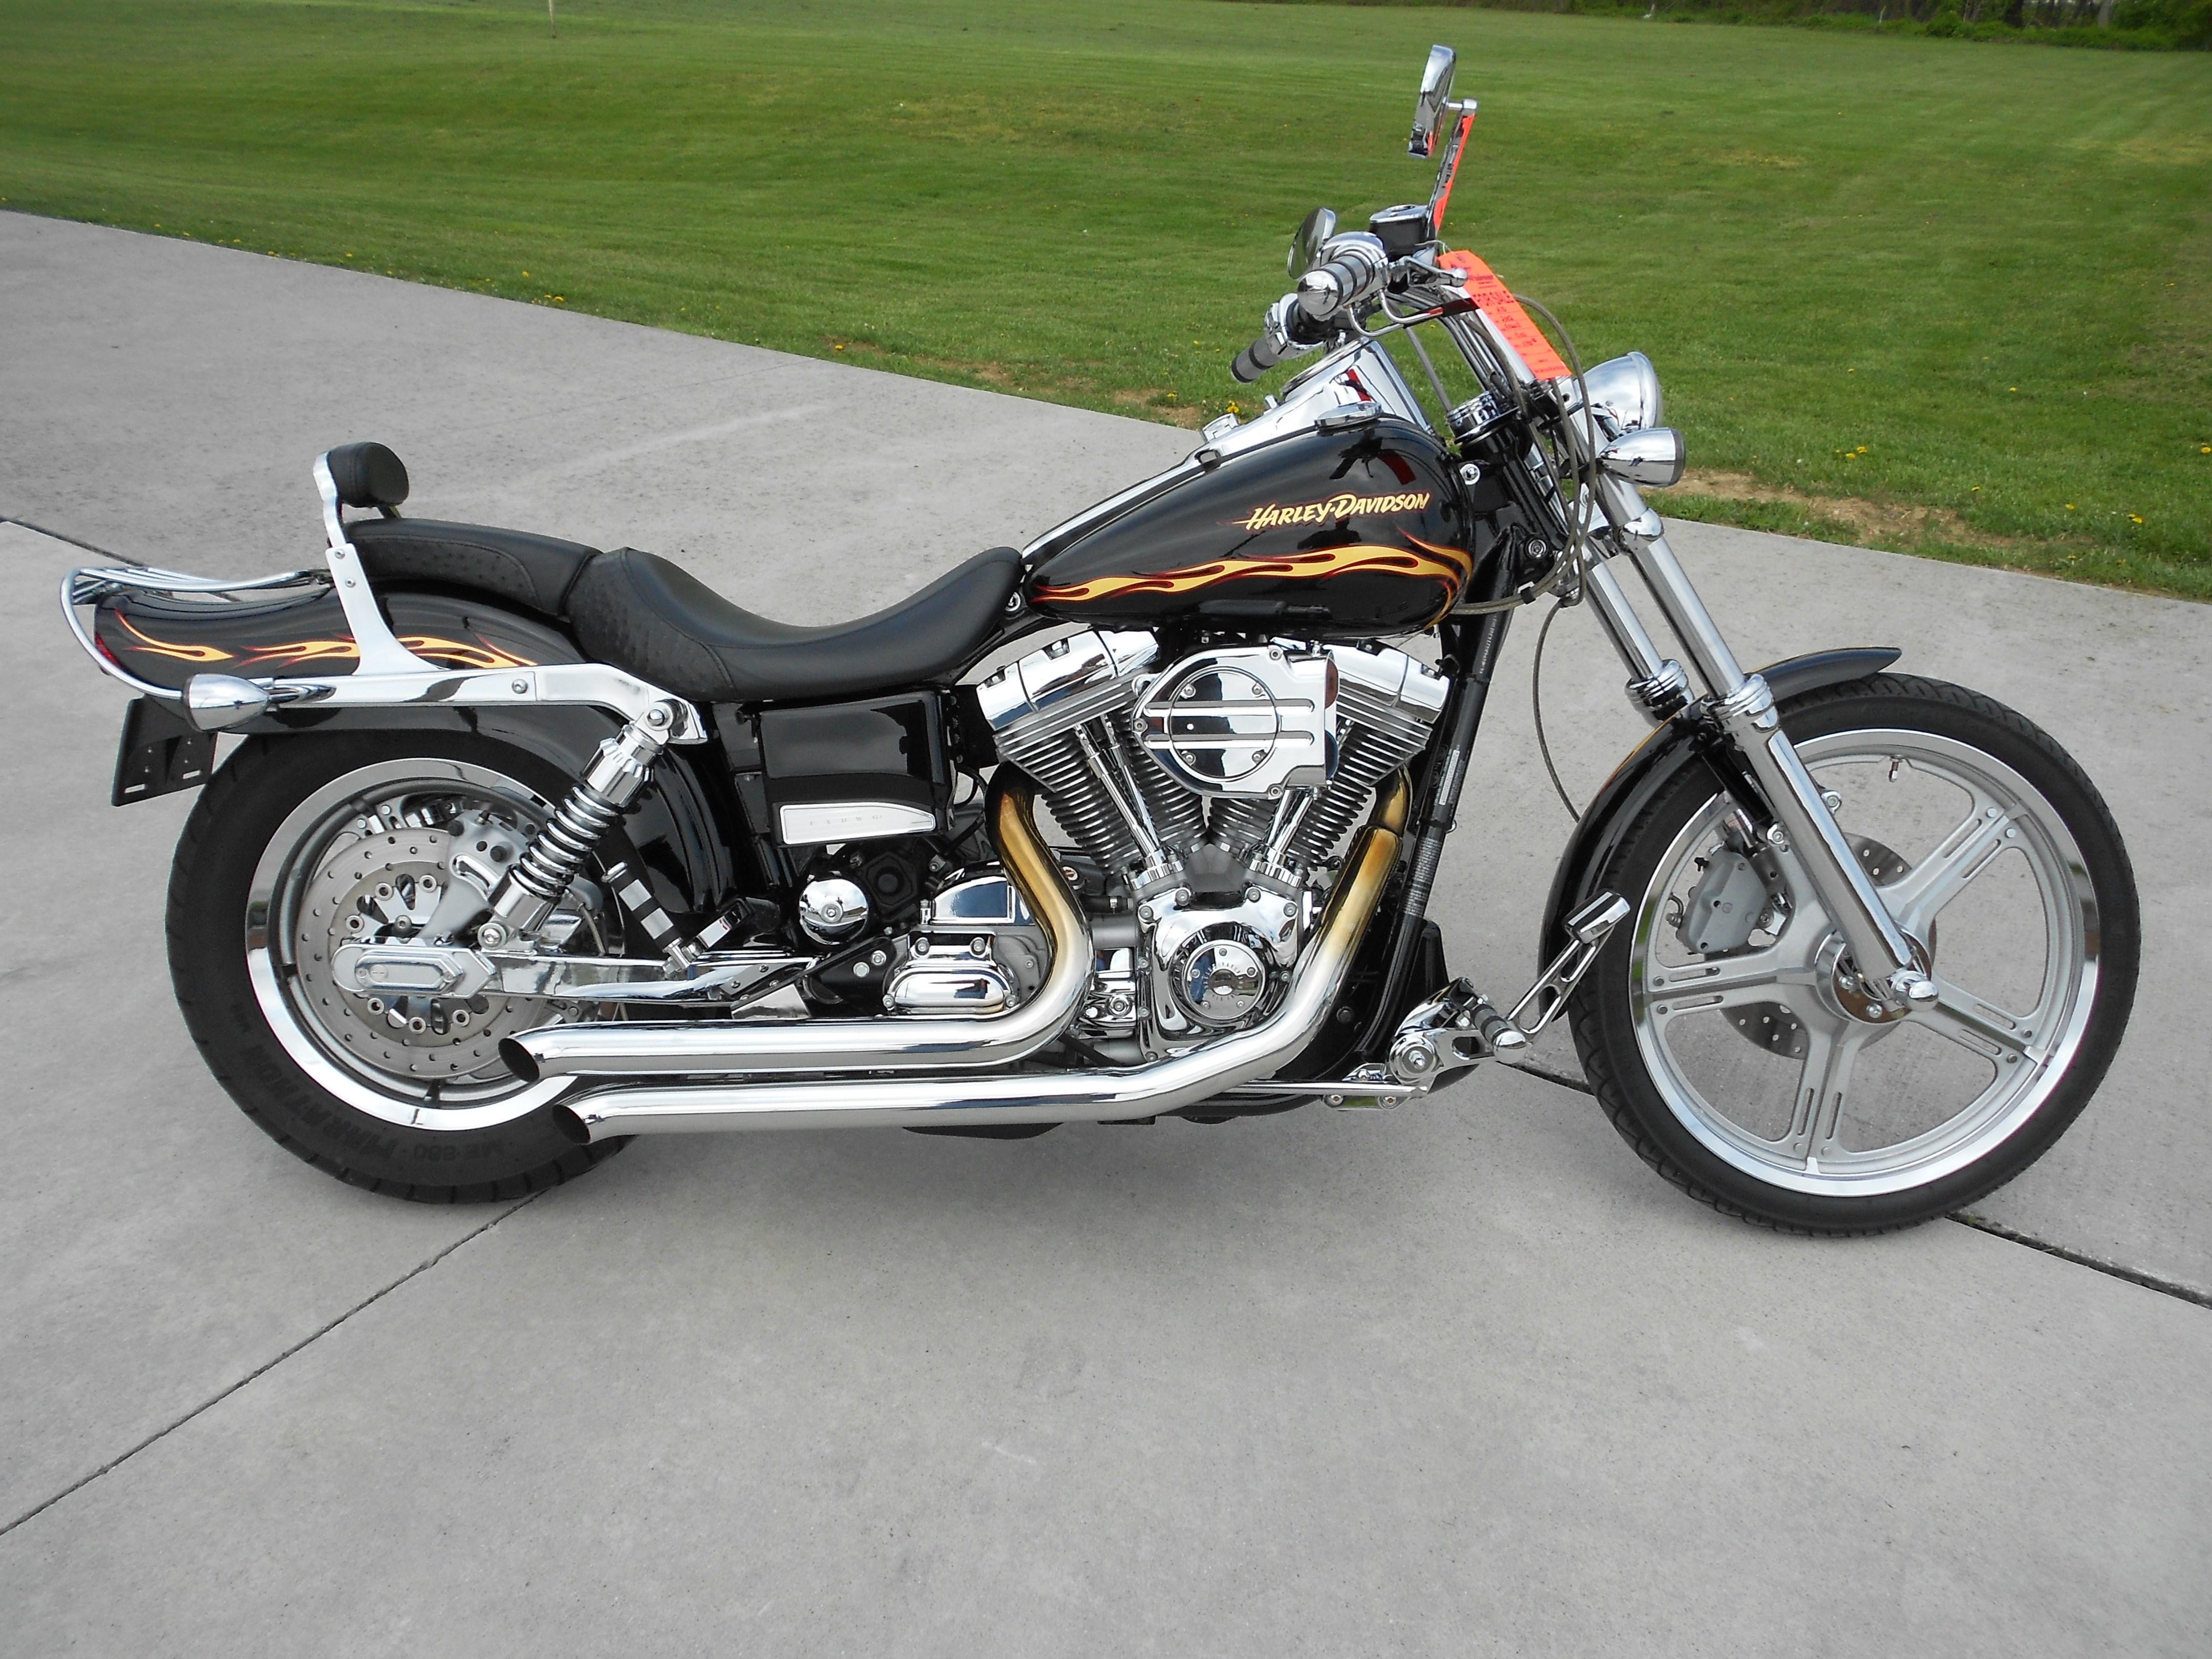 2002 Harley-Davidson® FXDWG3 Dyna